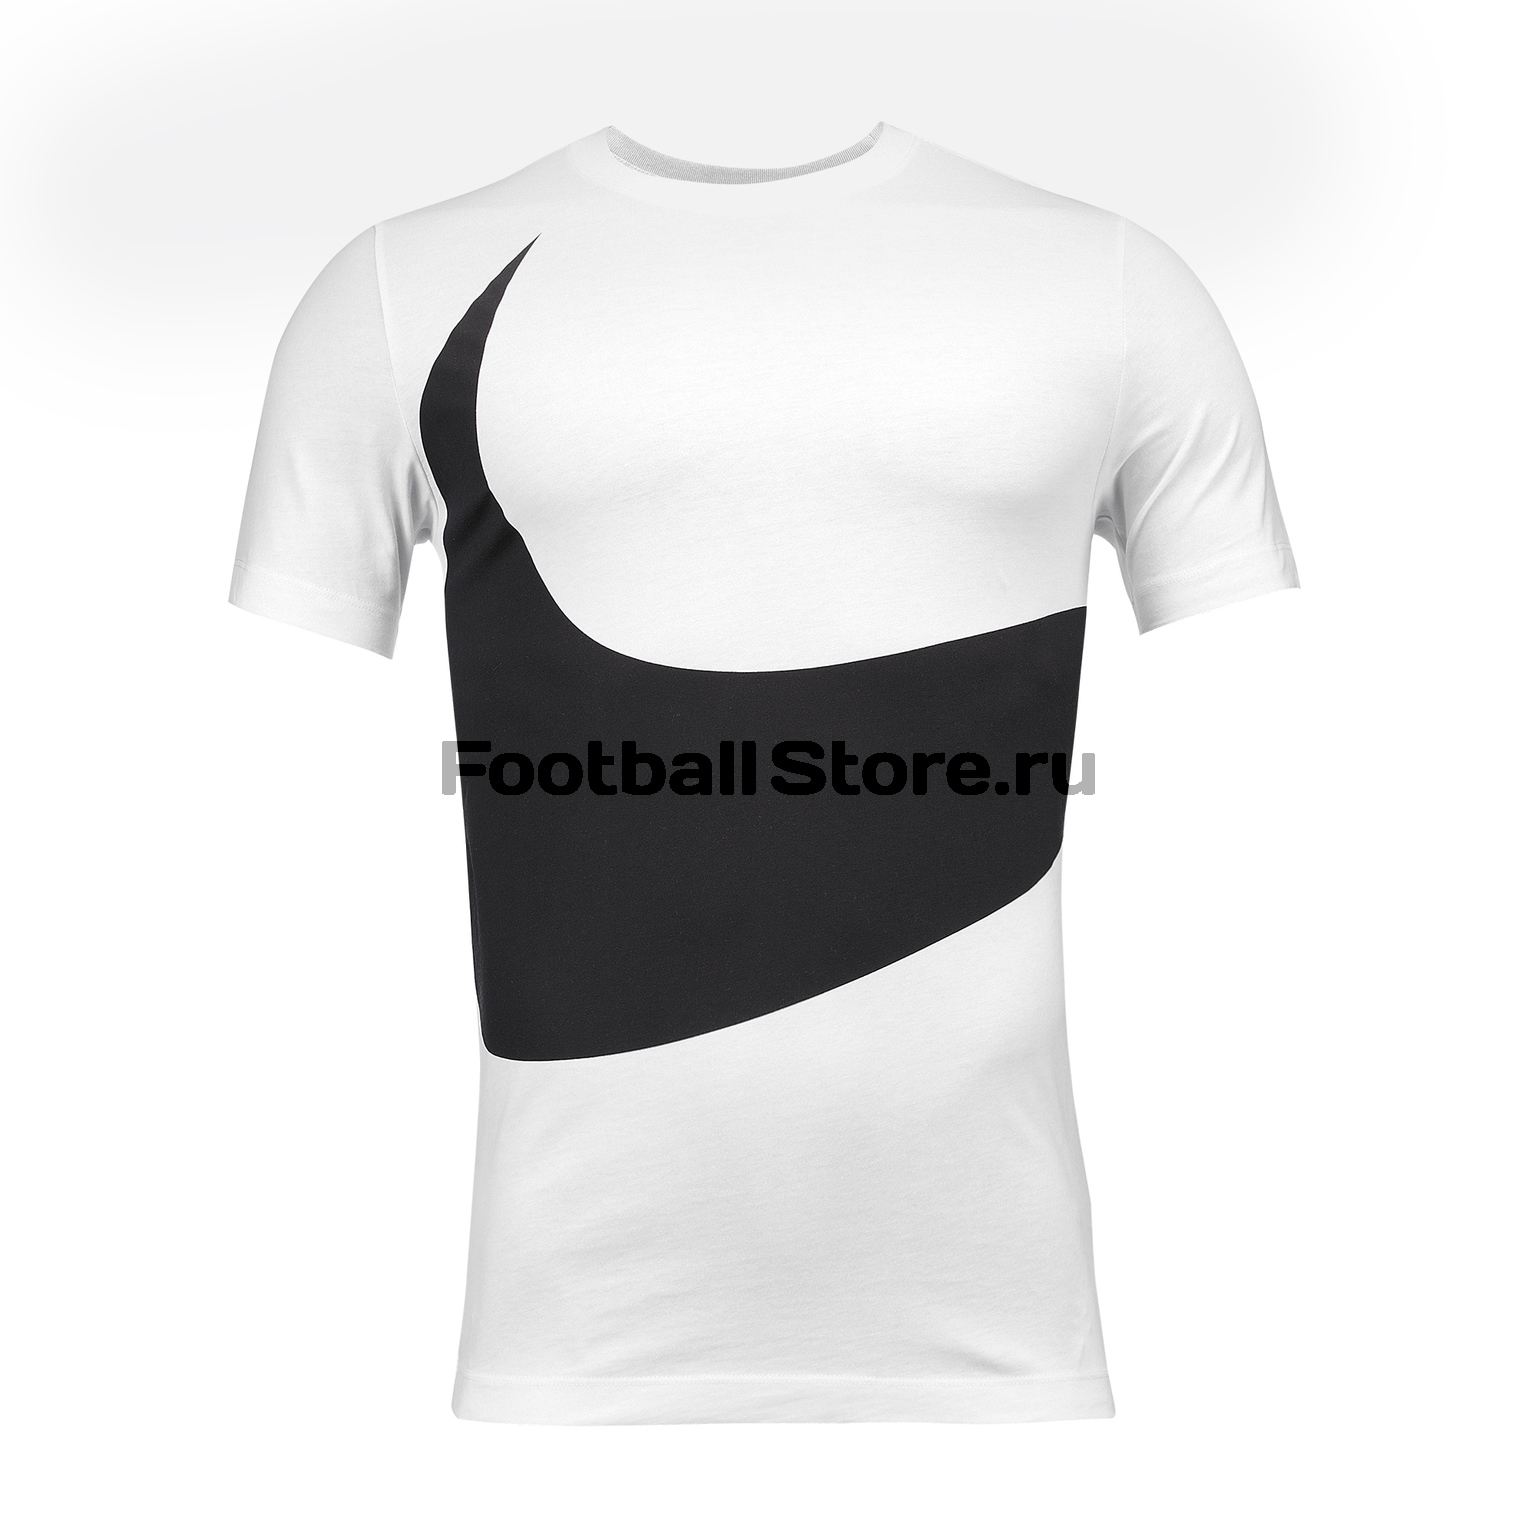 Футболка хлопковая Nike Tee HBR Swoosh 1 AR5191-103 цена